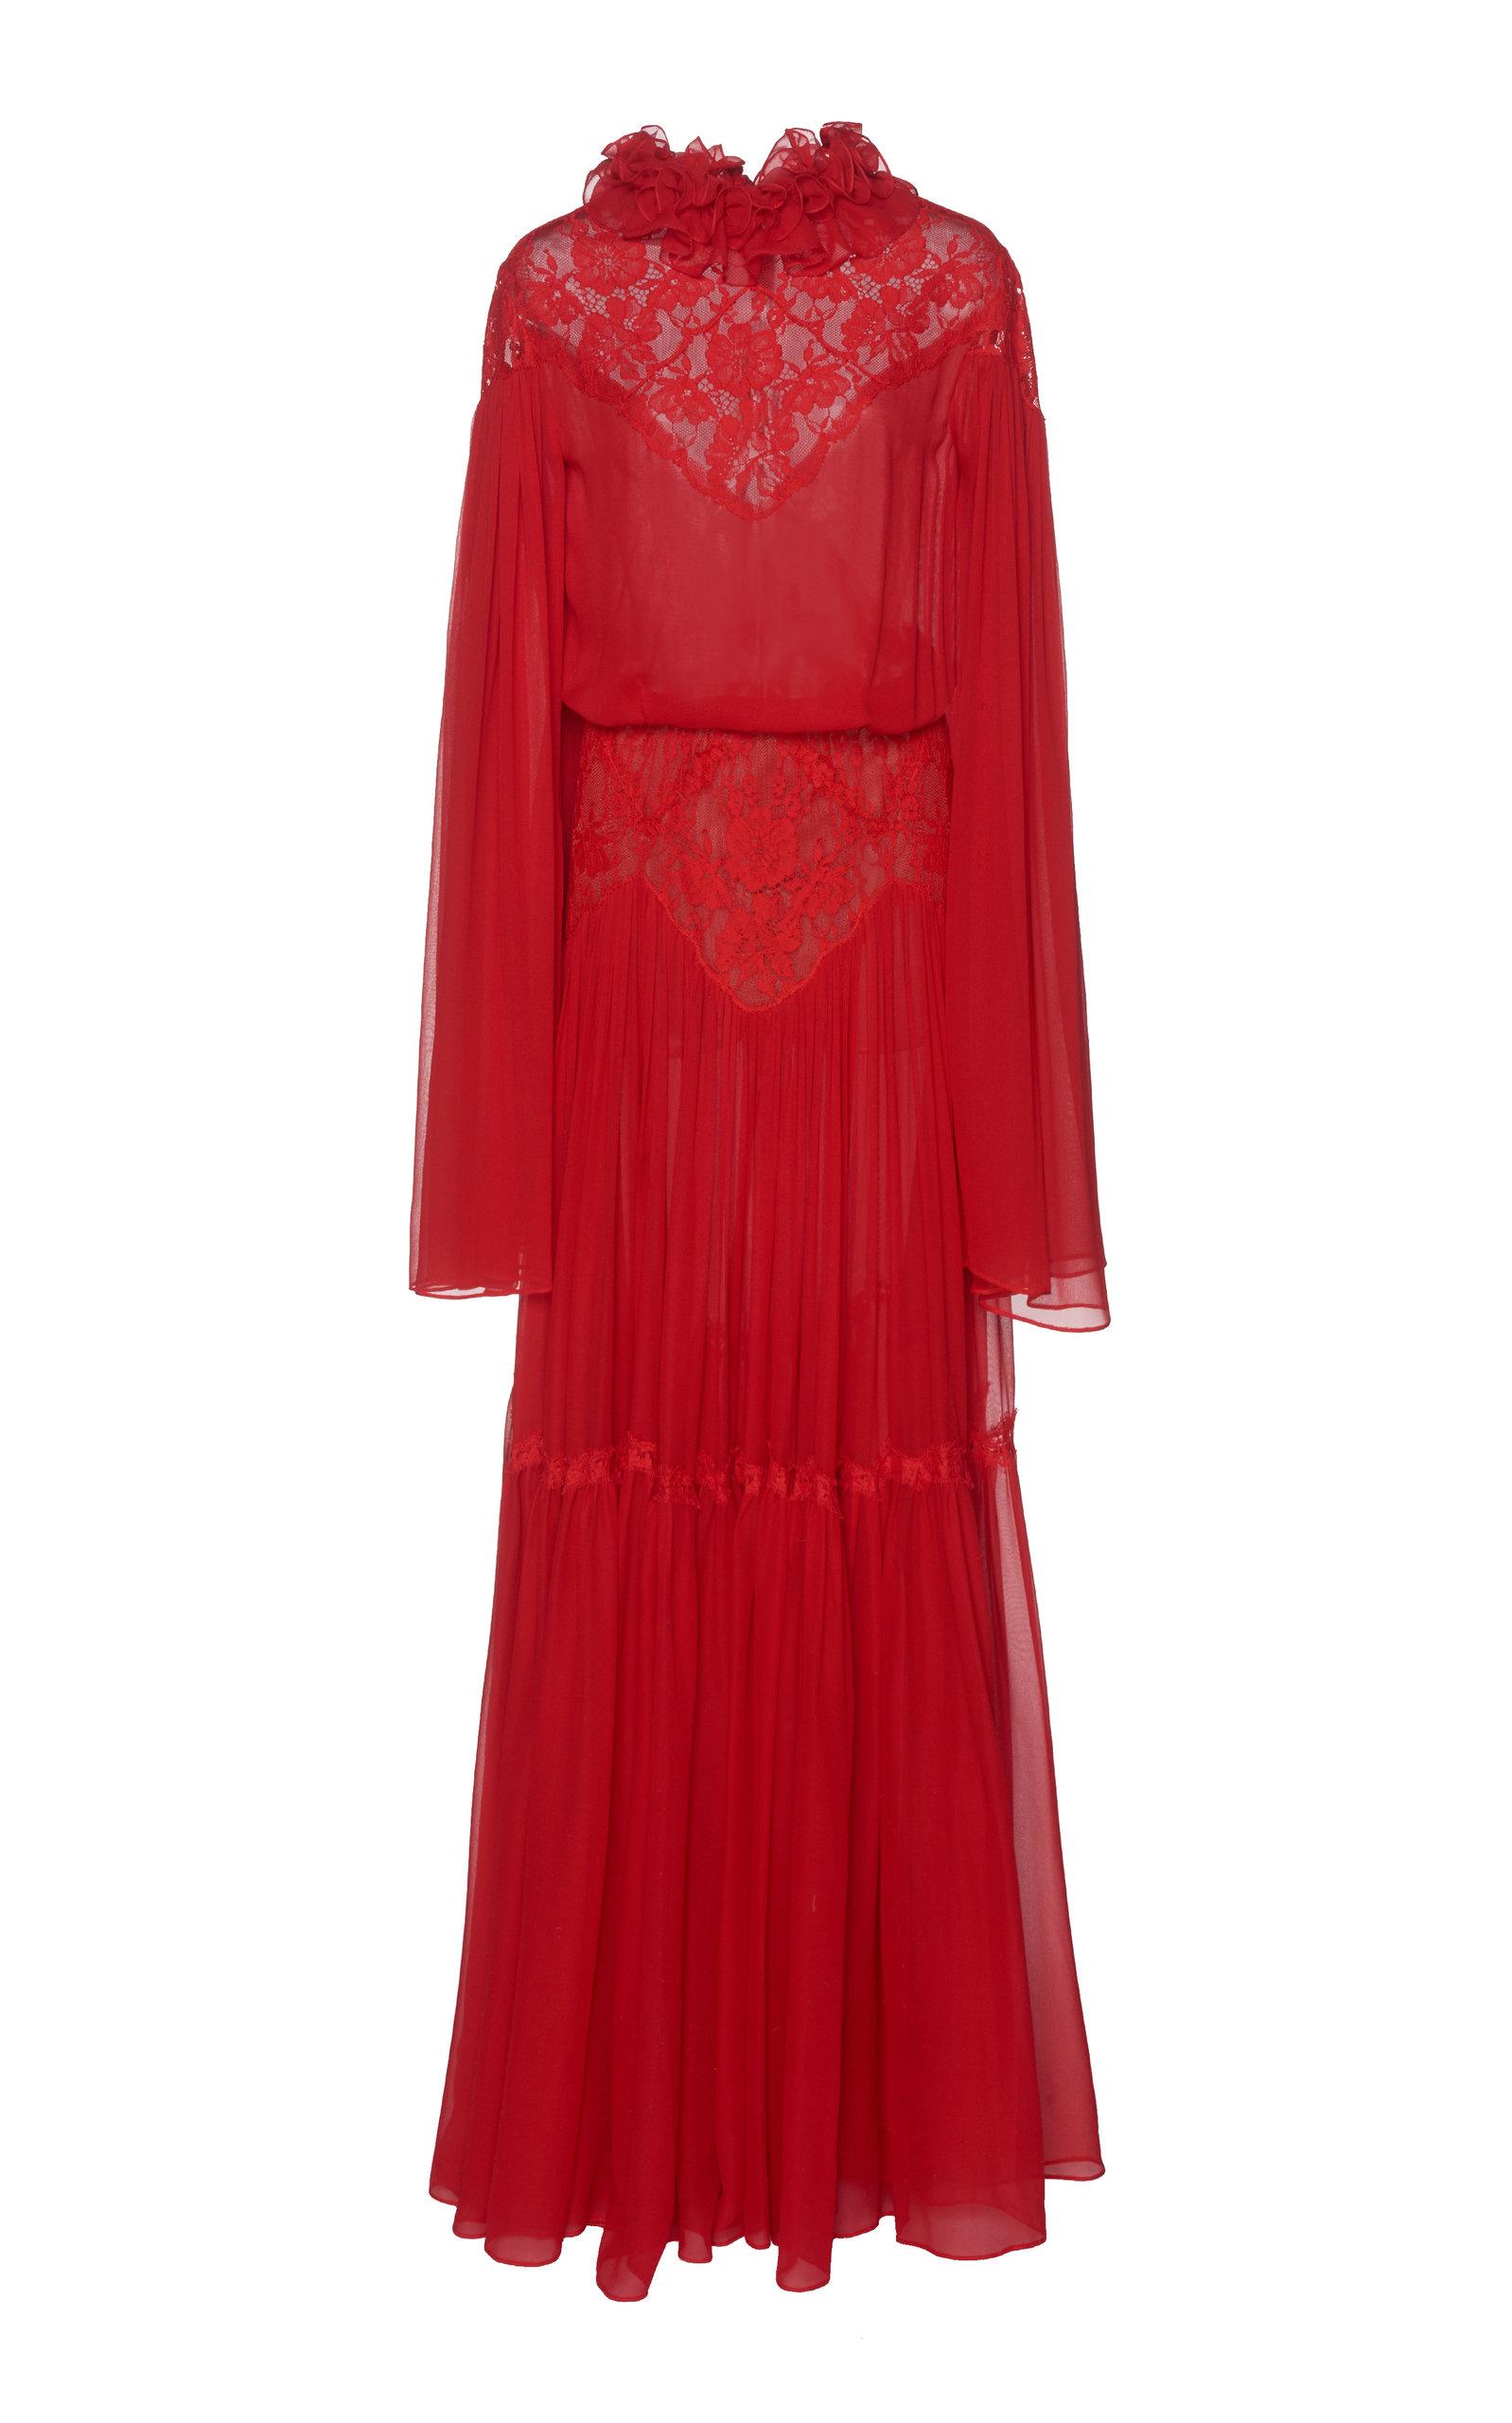 Costarellos ETHEREAL SILK CHIFFON DRESS